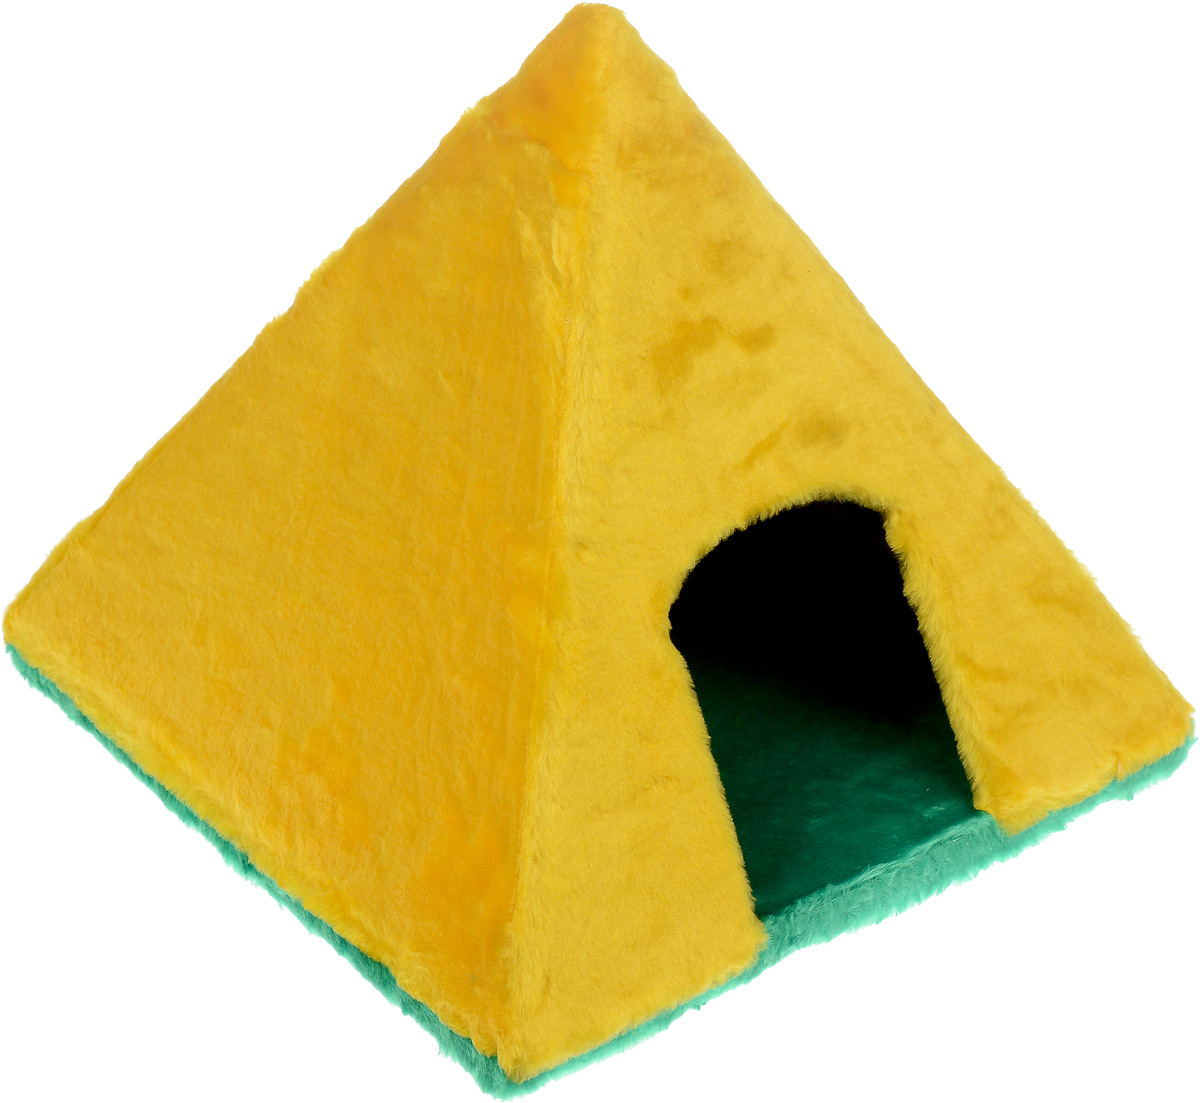 Домик для животных ЗооМарк Пирамидка, 41 х 41 х 37 см the doors the doors the doors lp